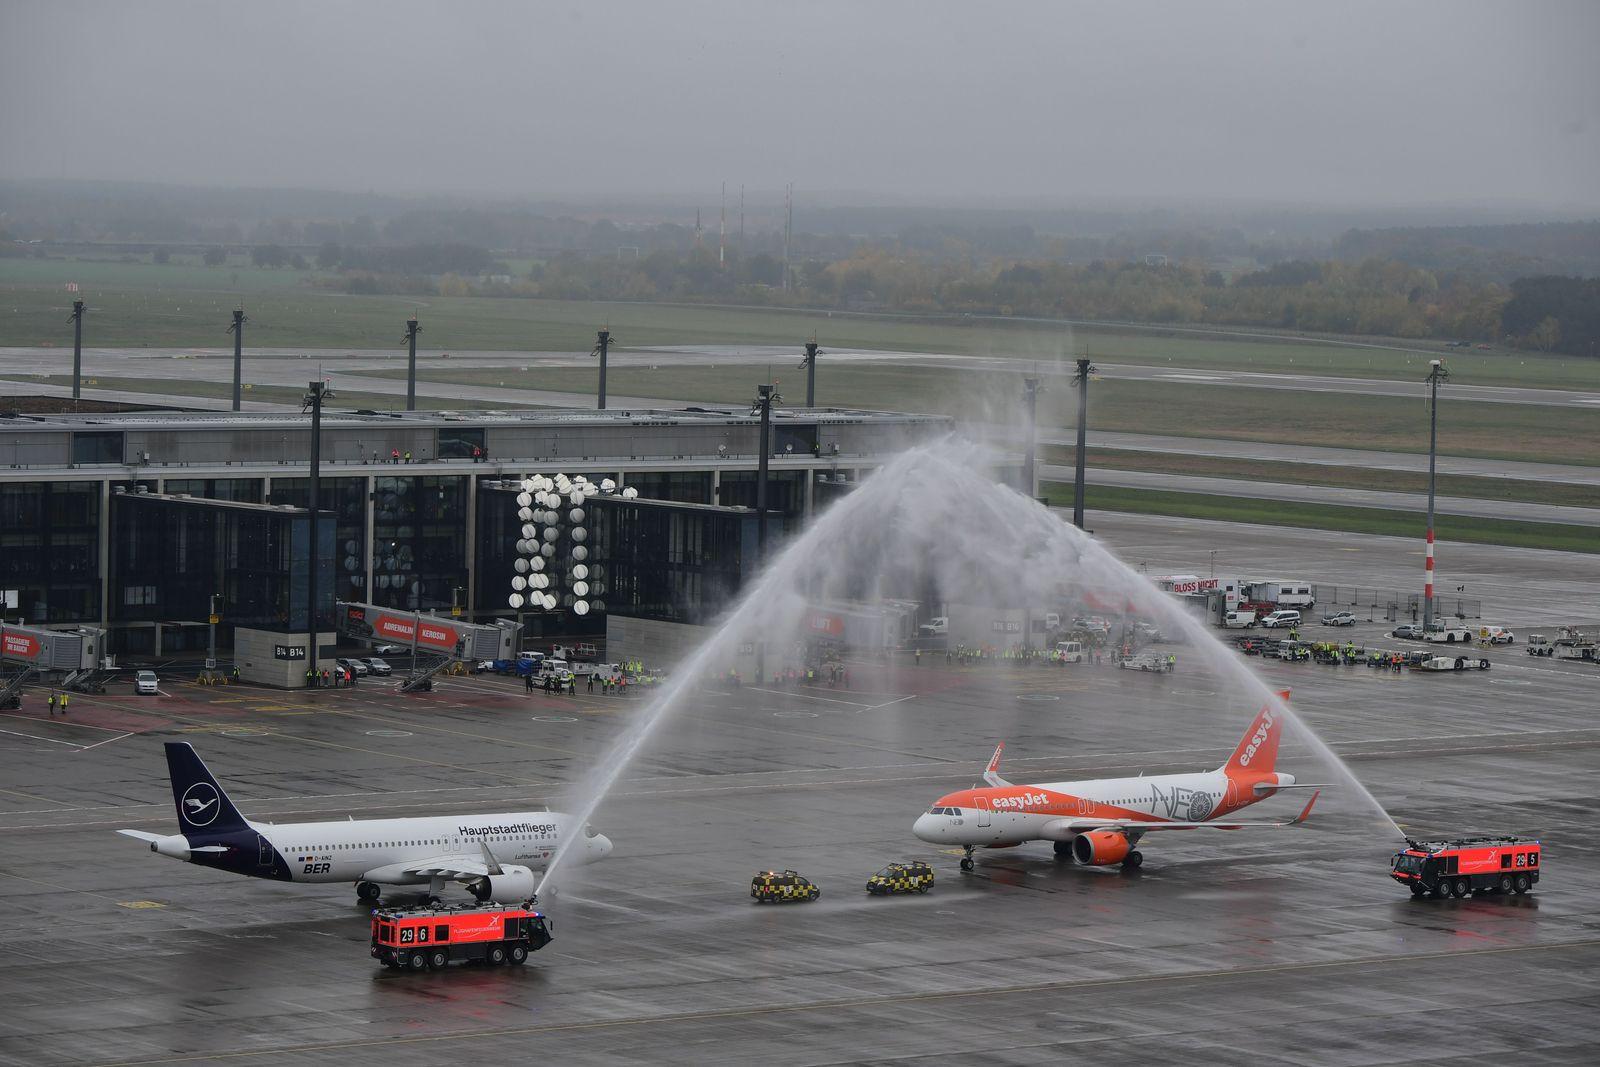 Opening of BER airport, Schoenefeld, Germany - 31 Oct 2020